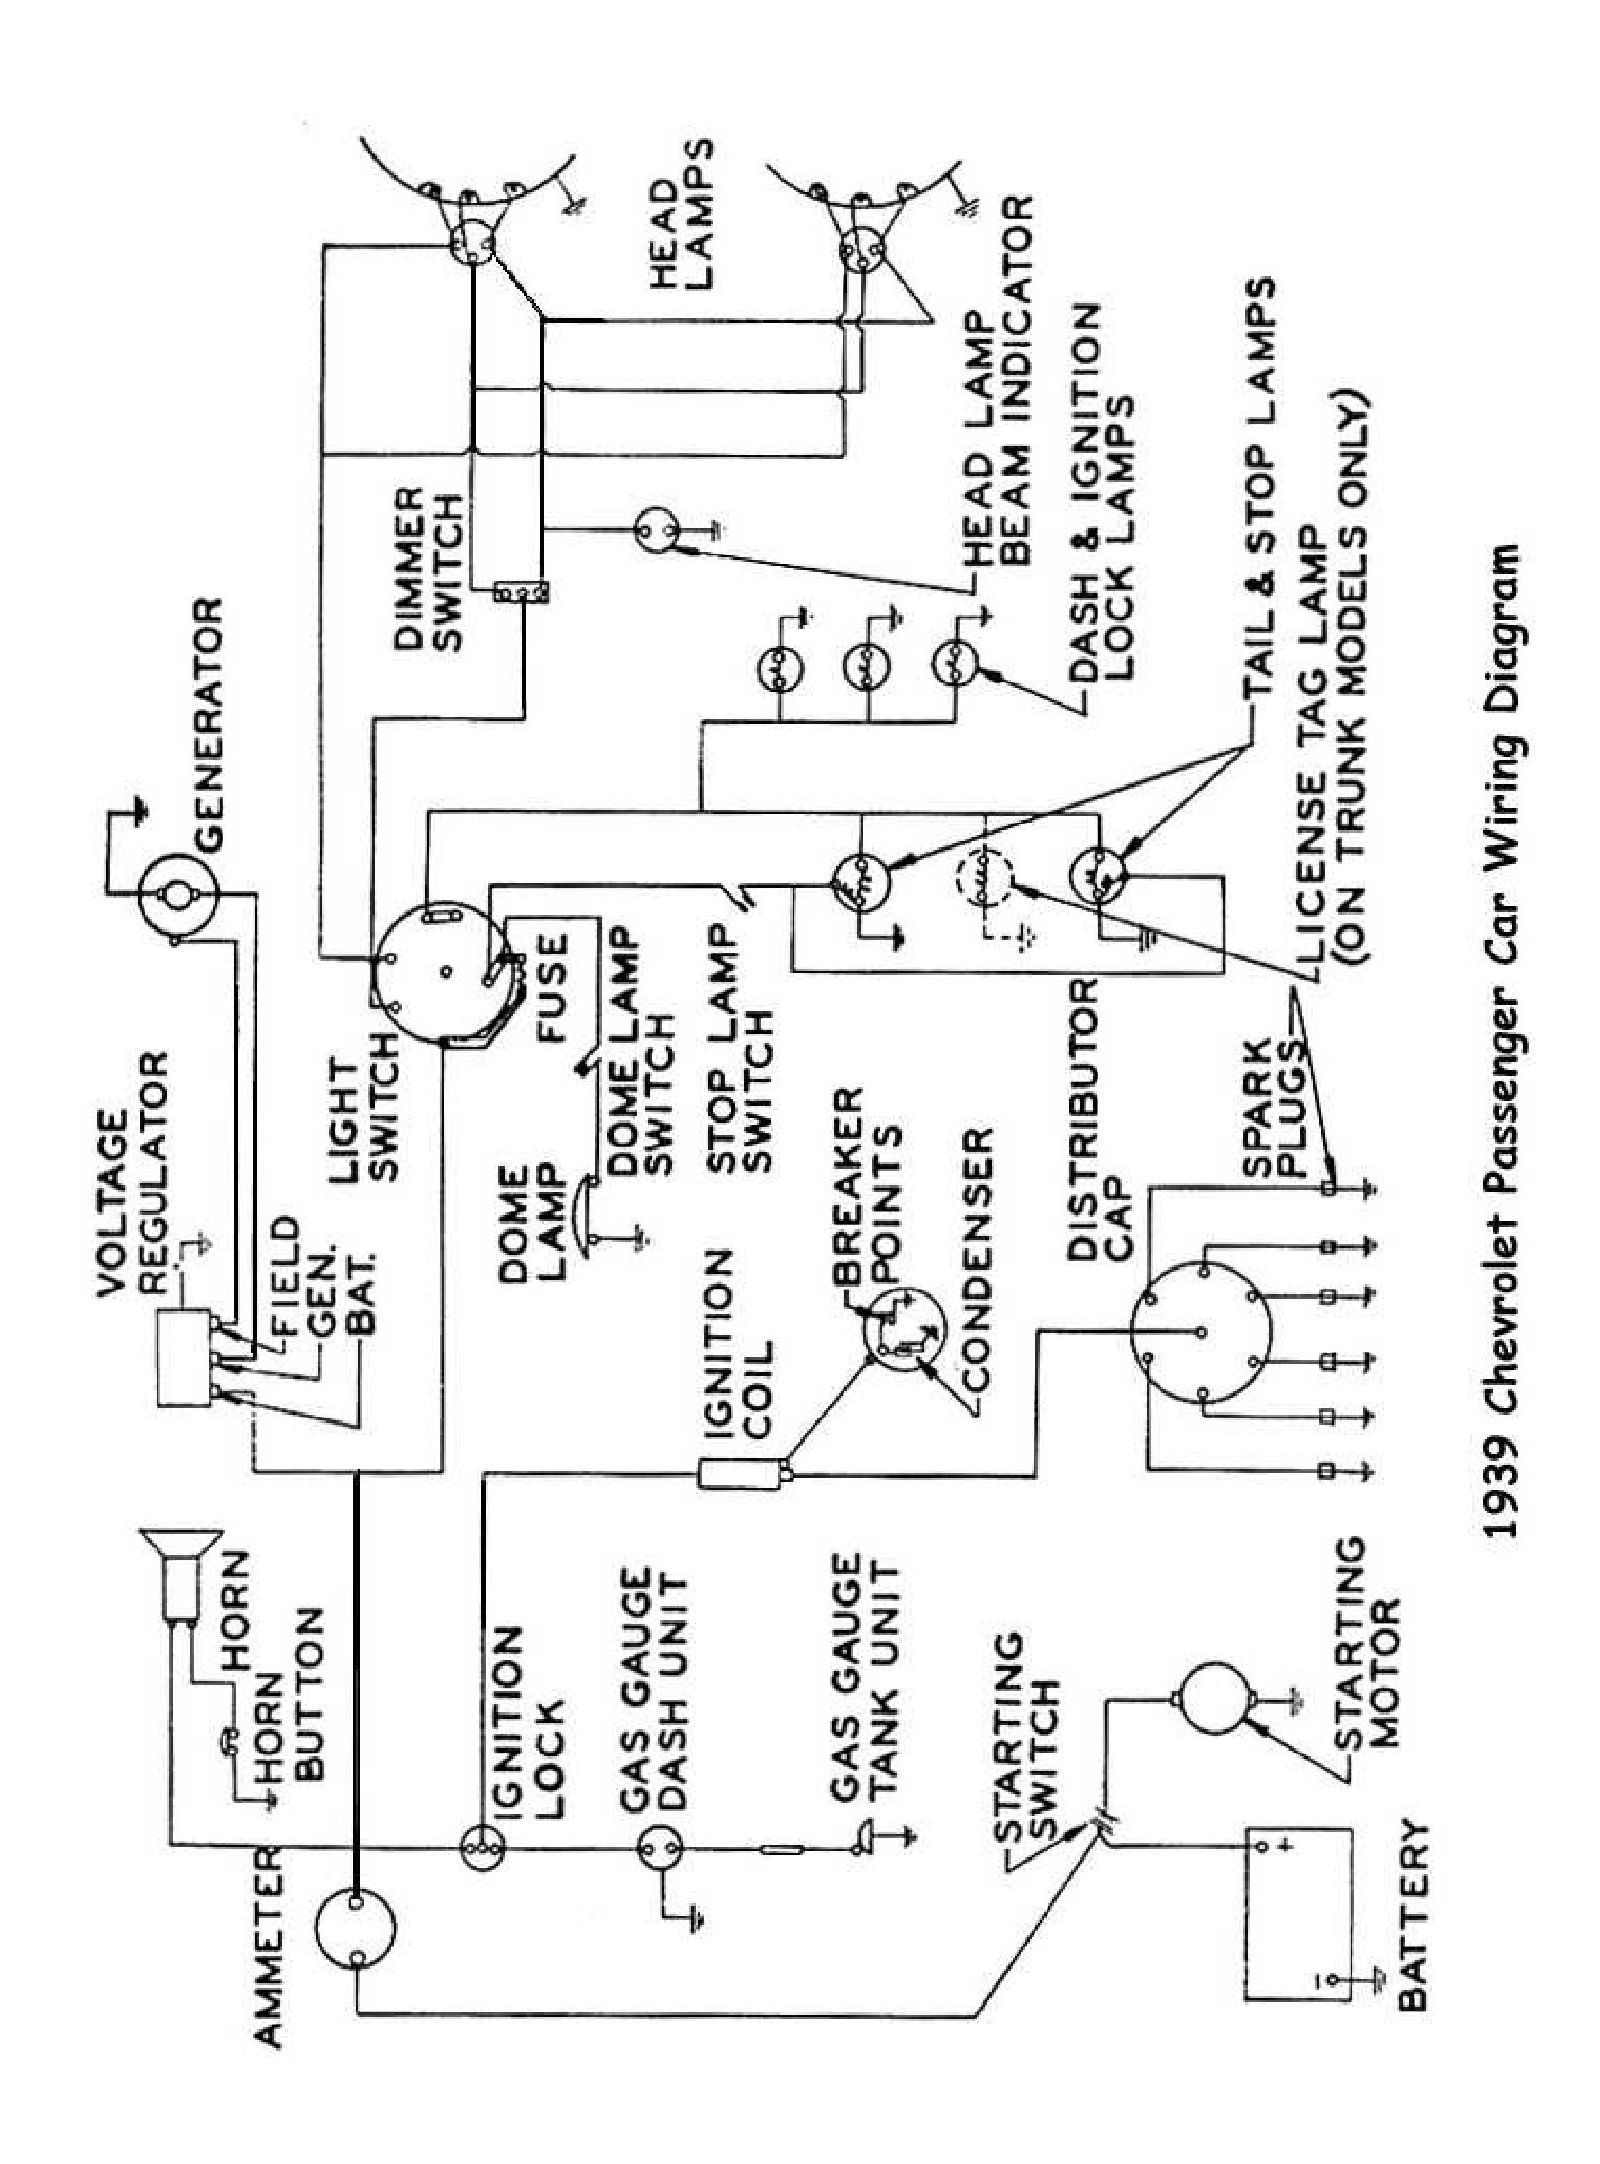 Remote car starter wiring diagram